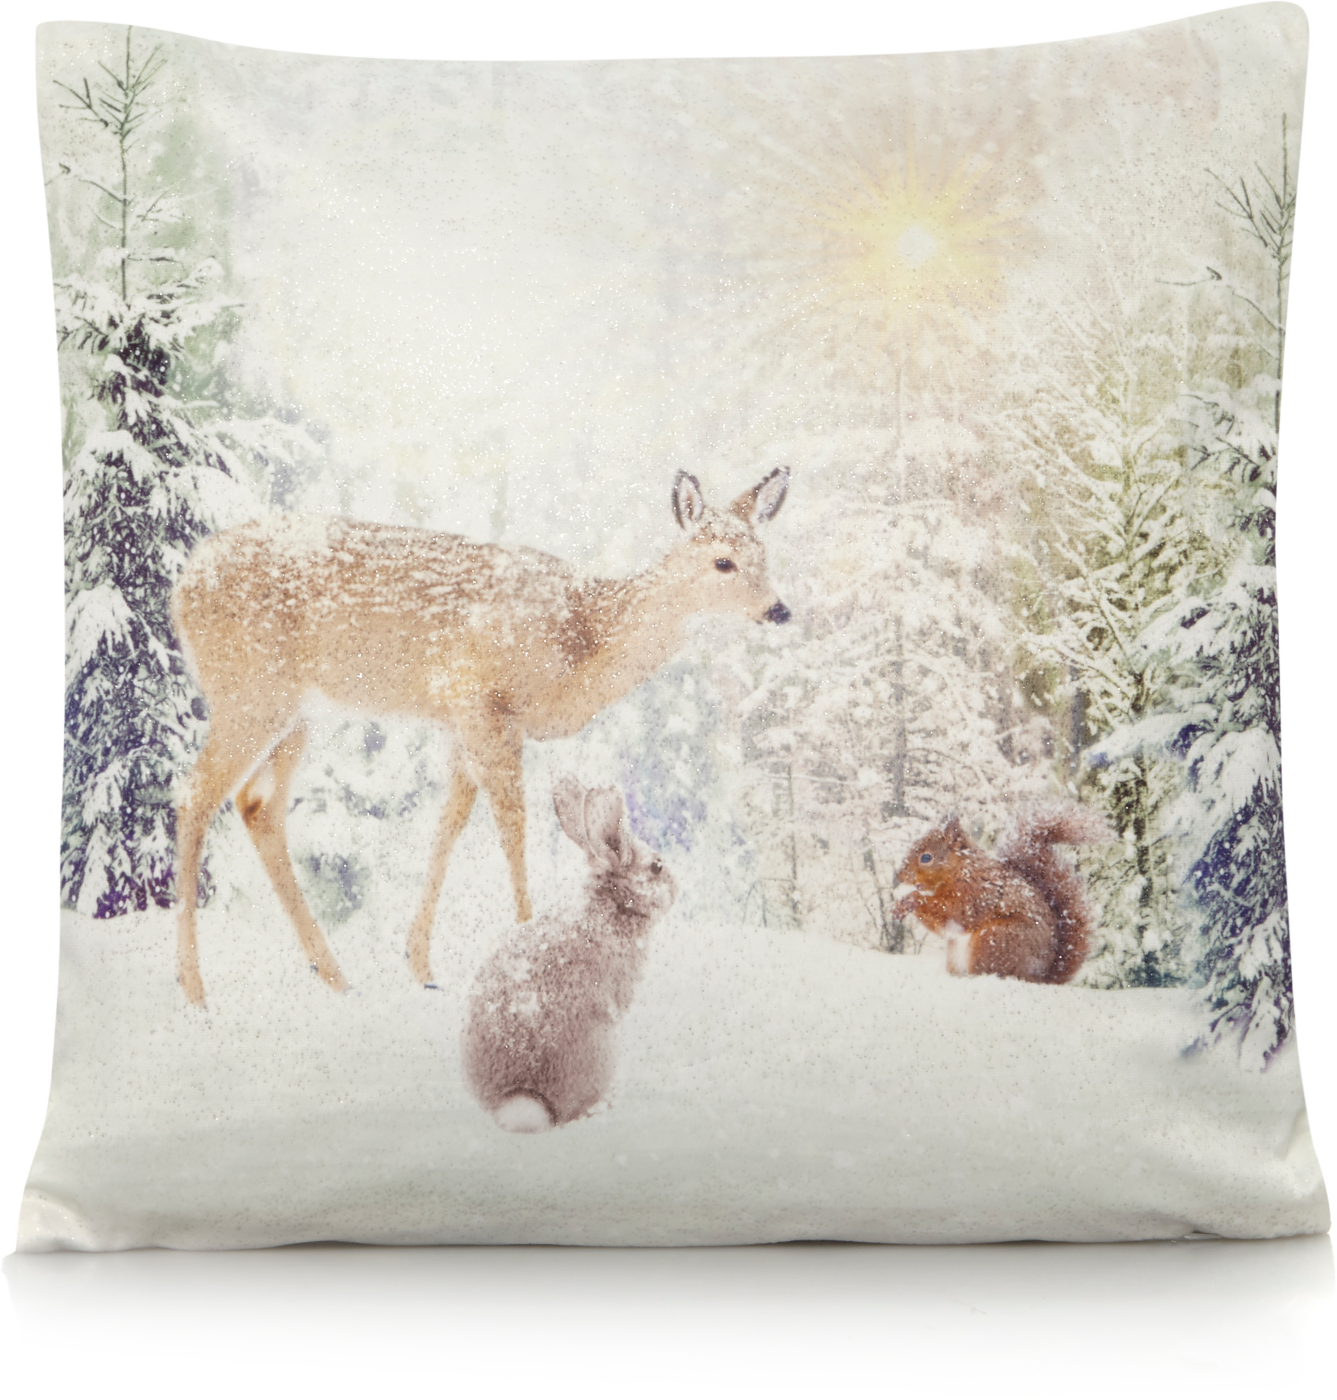 Deer and Rabbit Glitter Scene Cushion Cushions